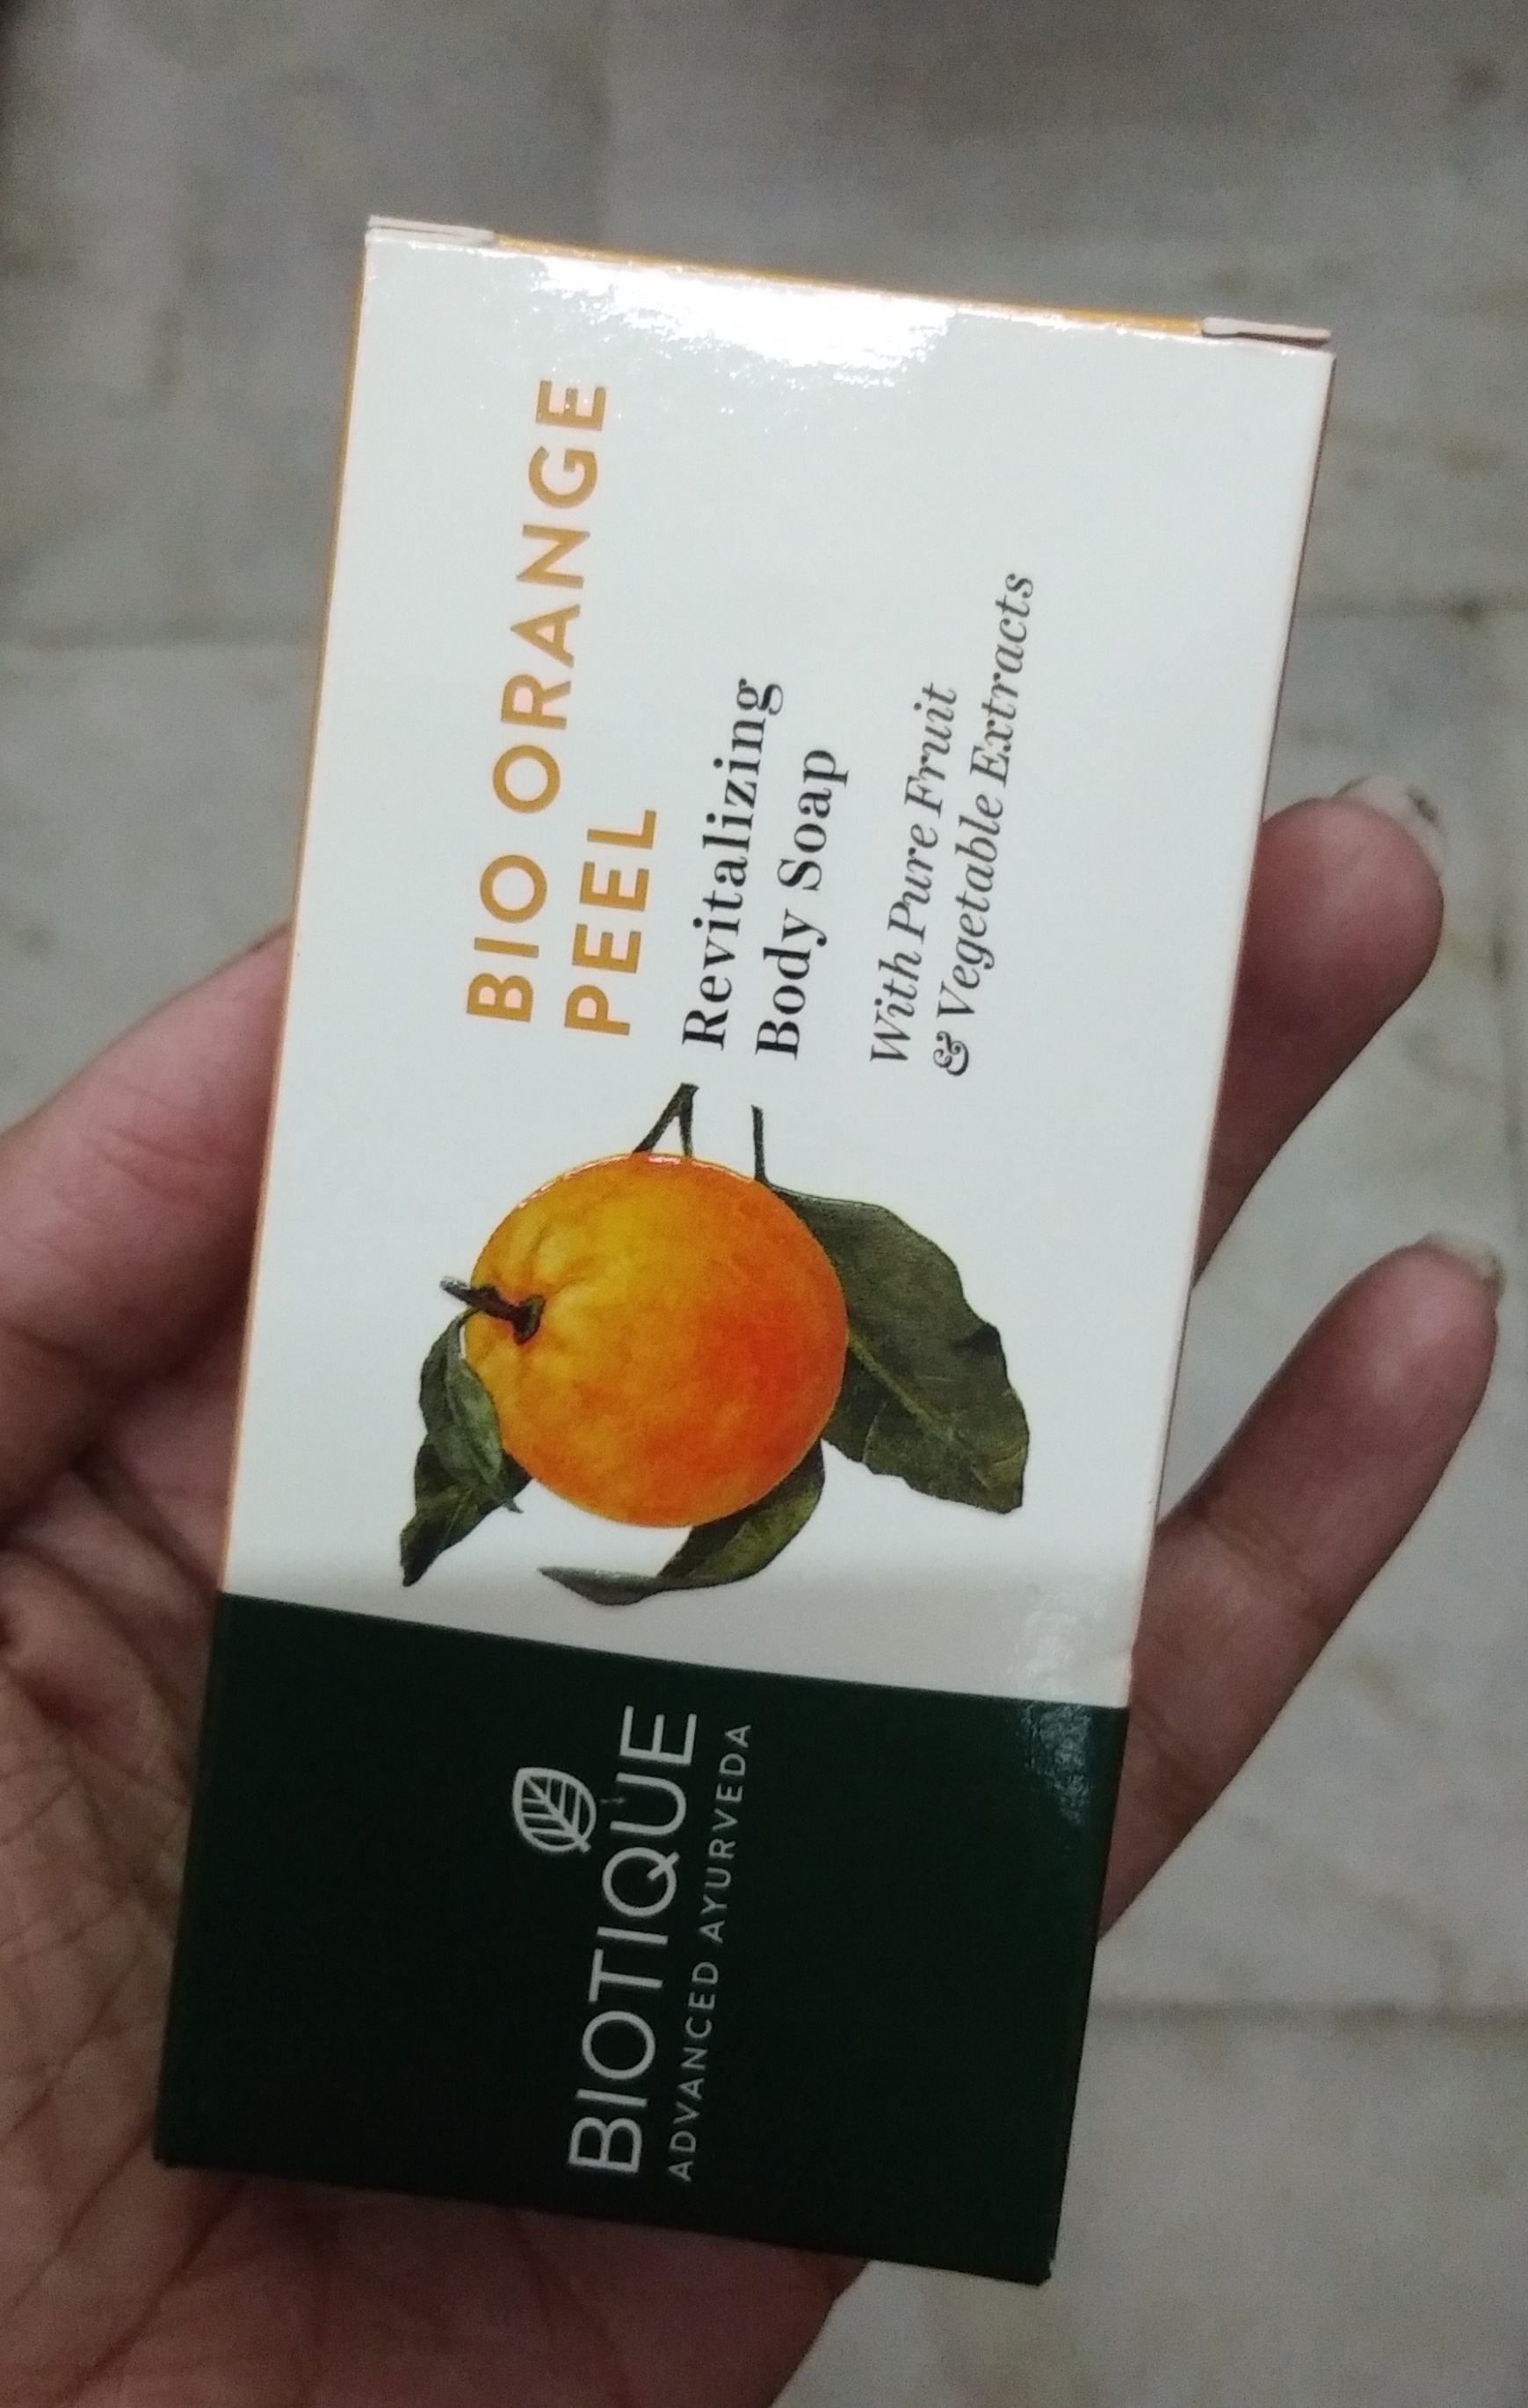 Biotique Bio Orange Peel Body Revitalizing Body Soap pic 1-A scrub soap-By Nasreen